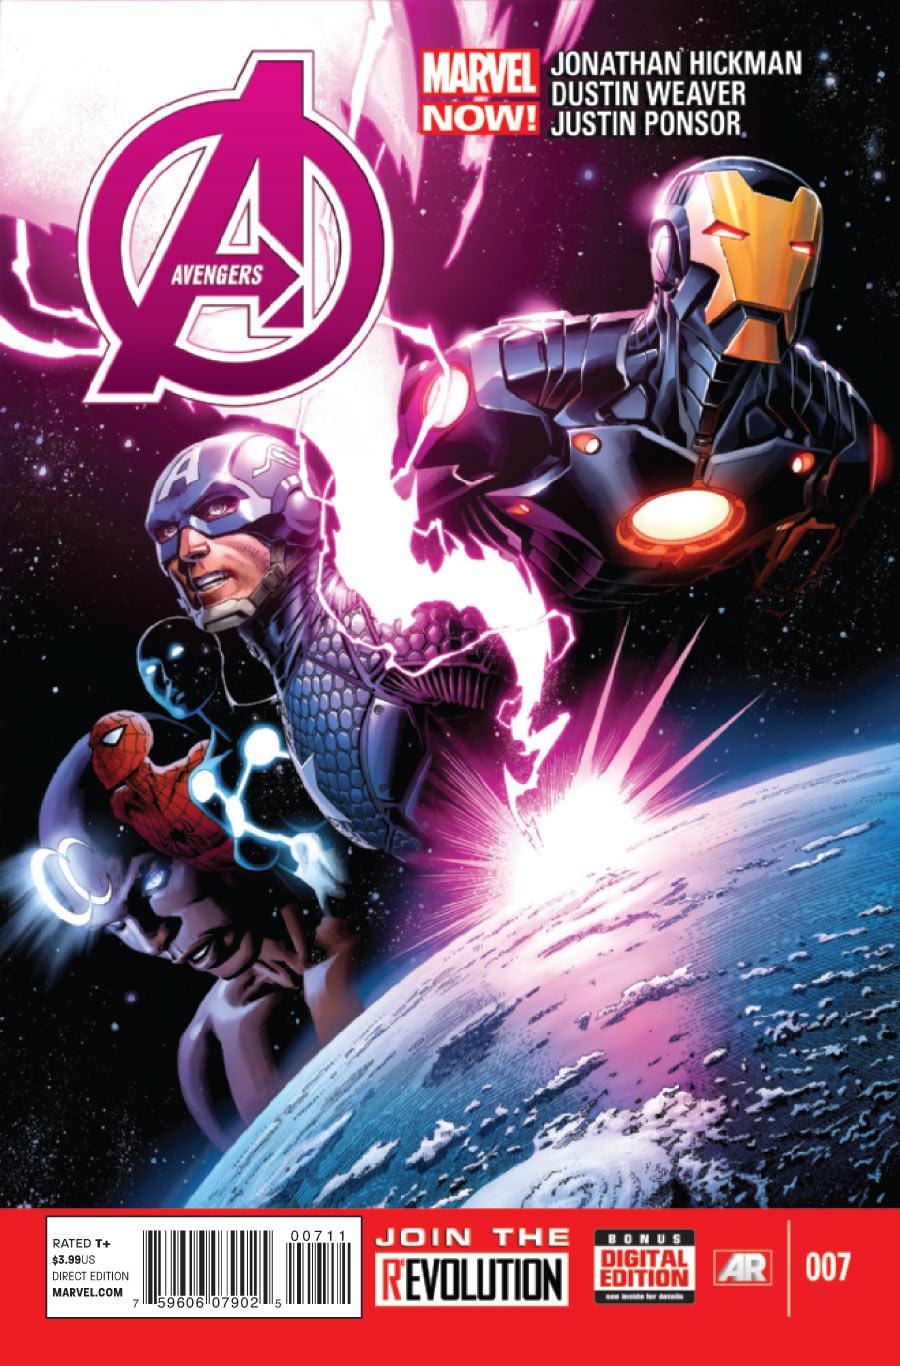 http://img4.wikia.nocookie.net/__cb20130303194224/marveldatabase/images/c/cb/Avengers_Vol_5_7.jpg